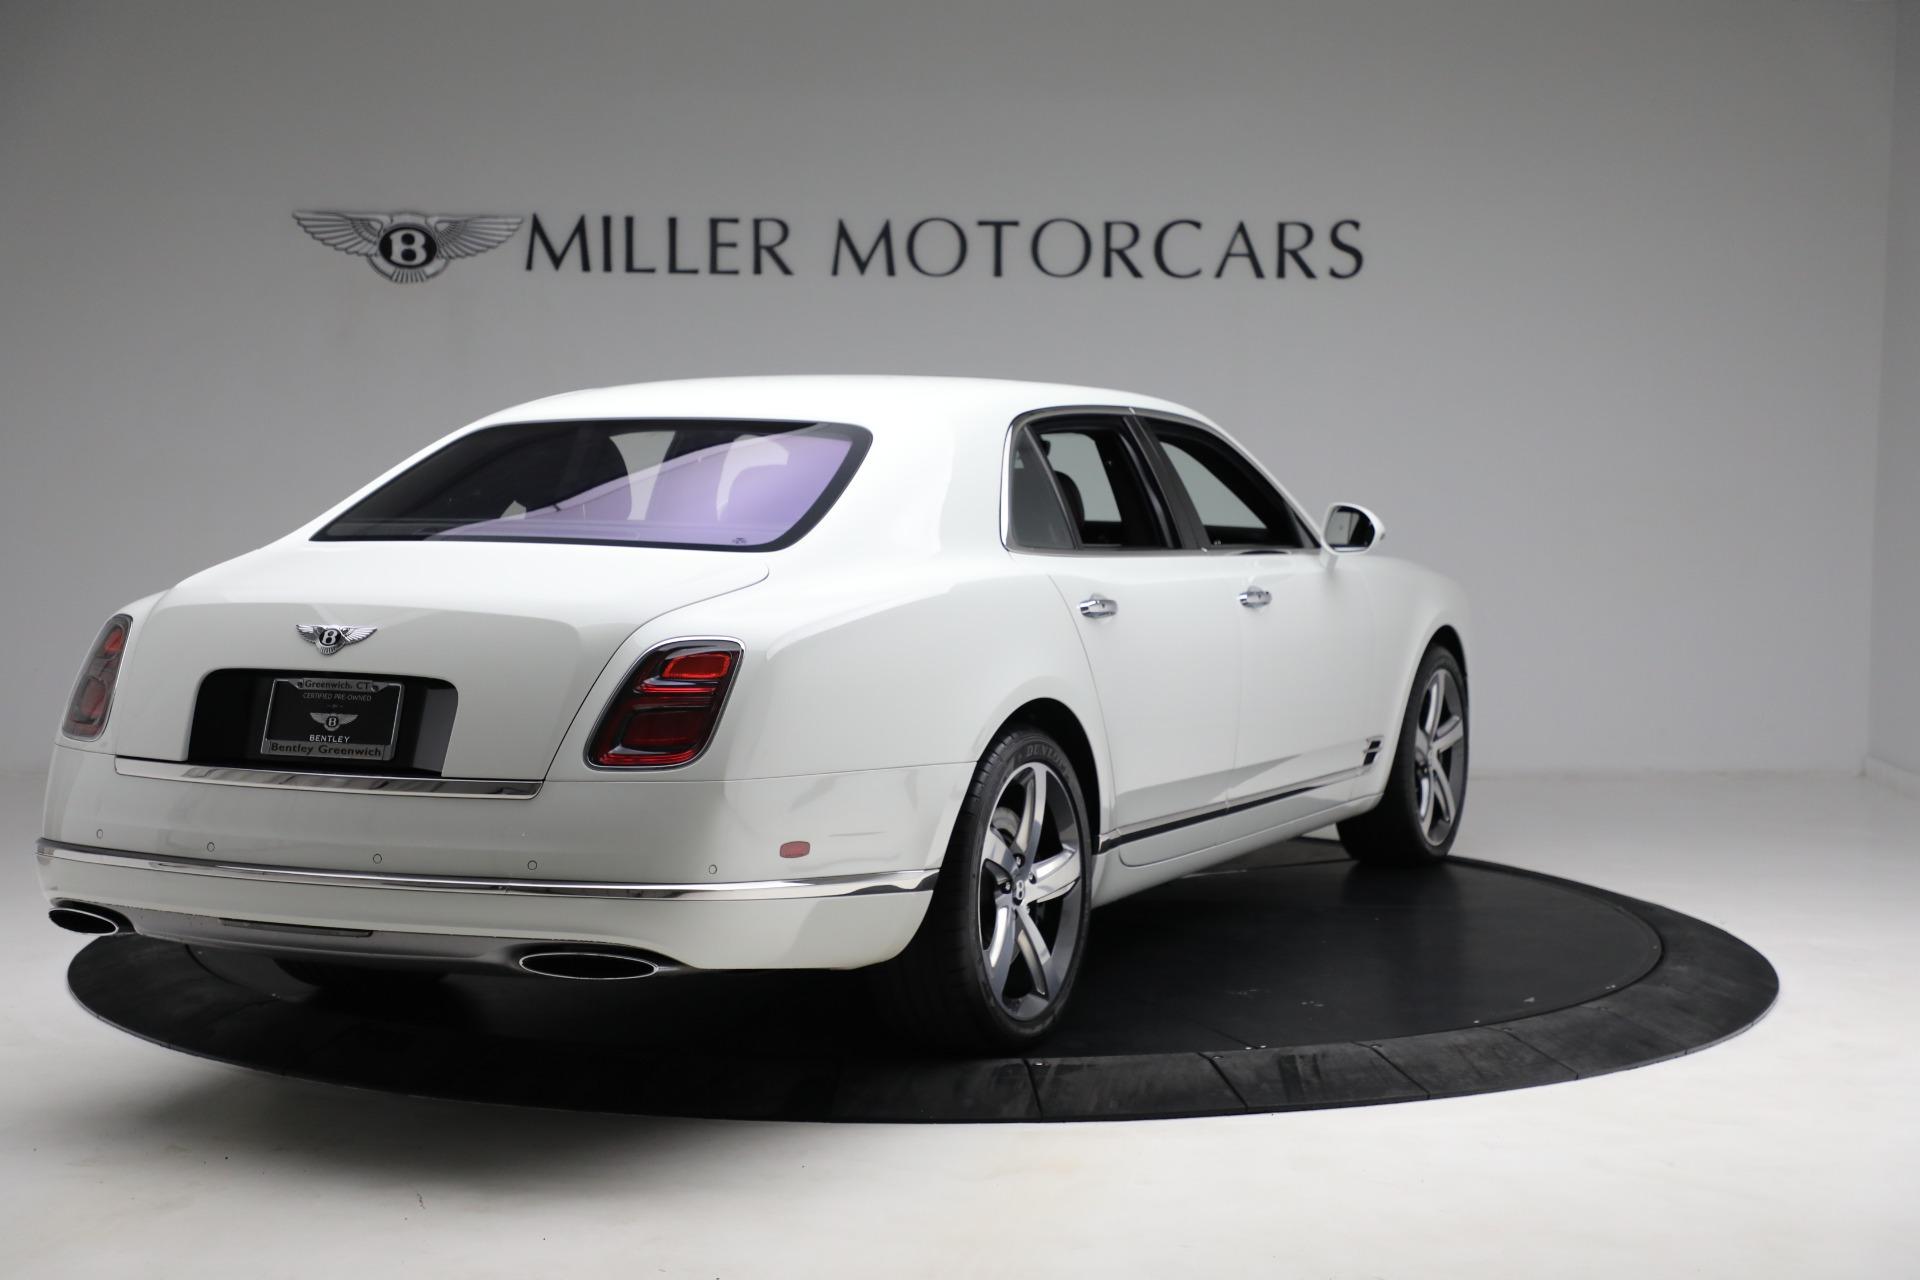 Used 2018 Bentley Mulsanne Speed For Sale In Westport, CT 2075_p6